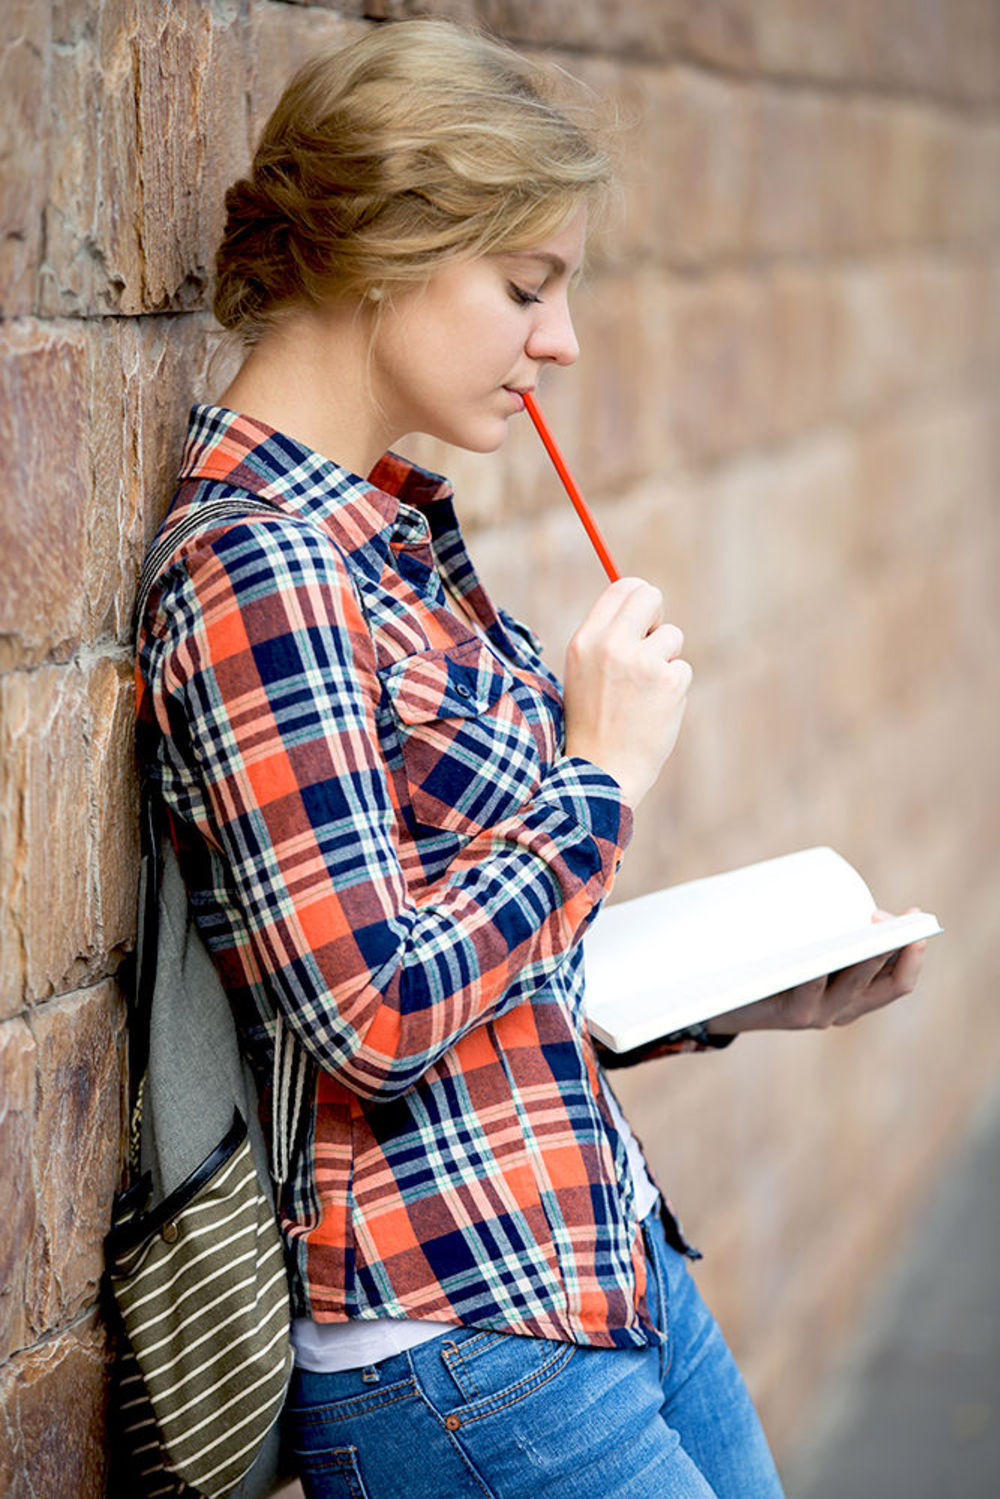 Девочка читает книгу, опираясь на дерево